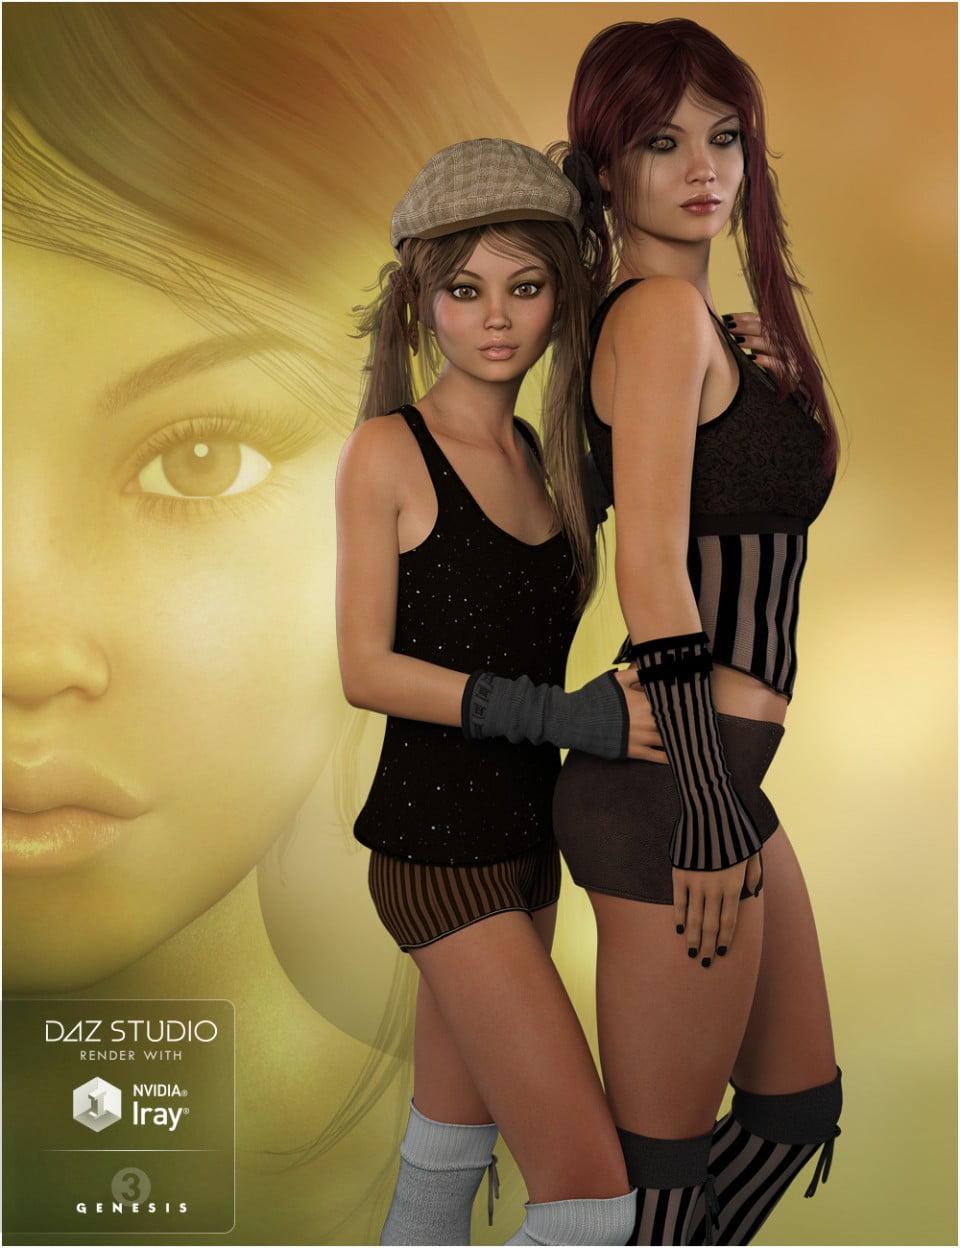 00-main-fwsa-octavia-hd-for-teen-josie-7-and-genesis-3-females-daz3d